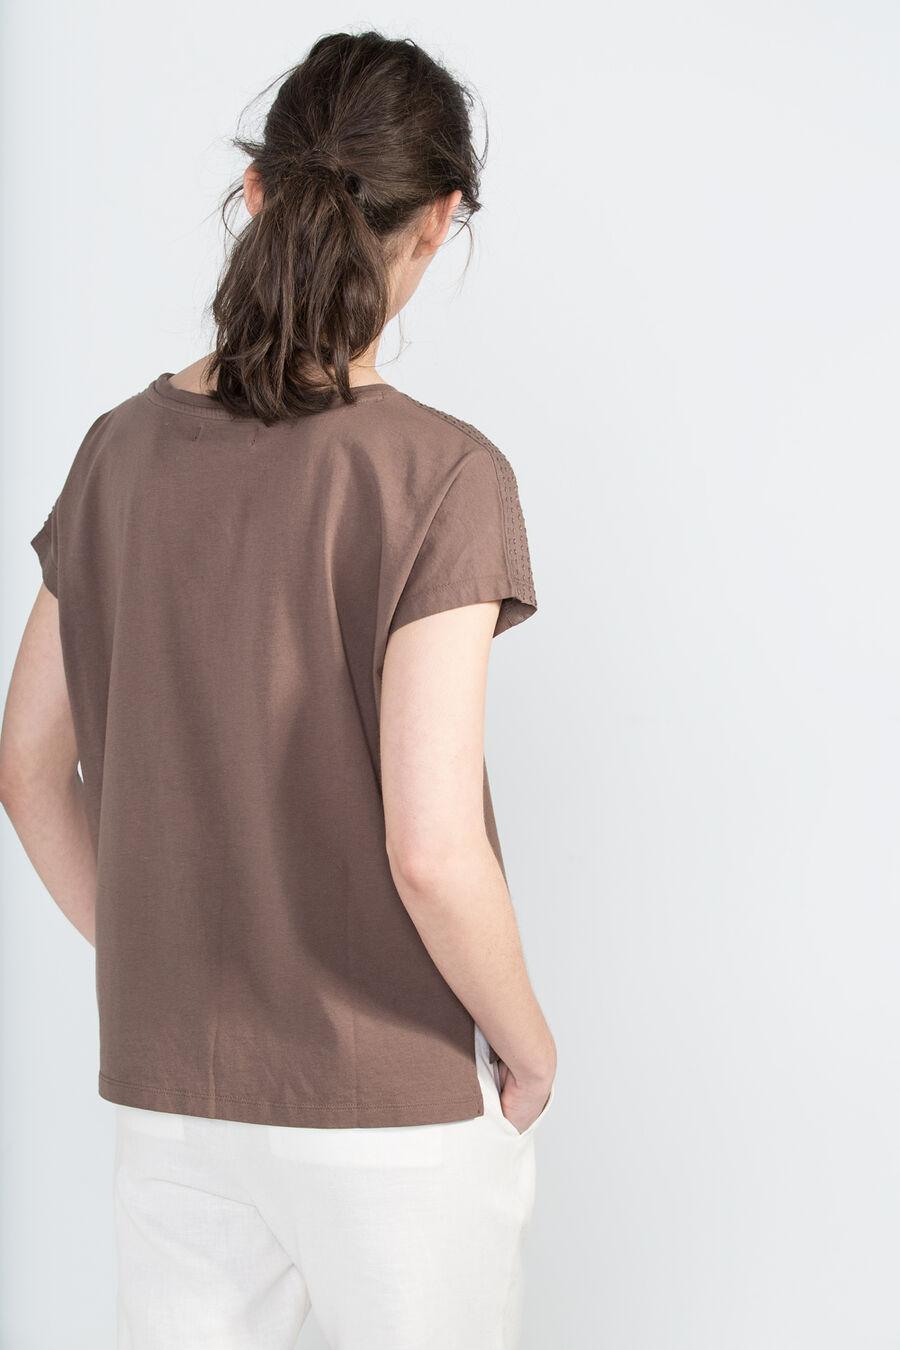 Backstitched t-shirt